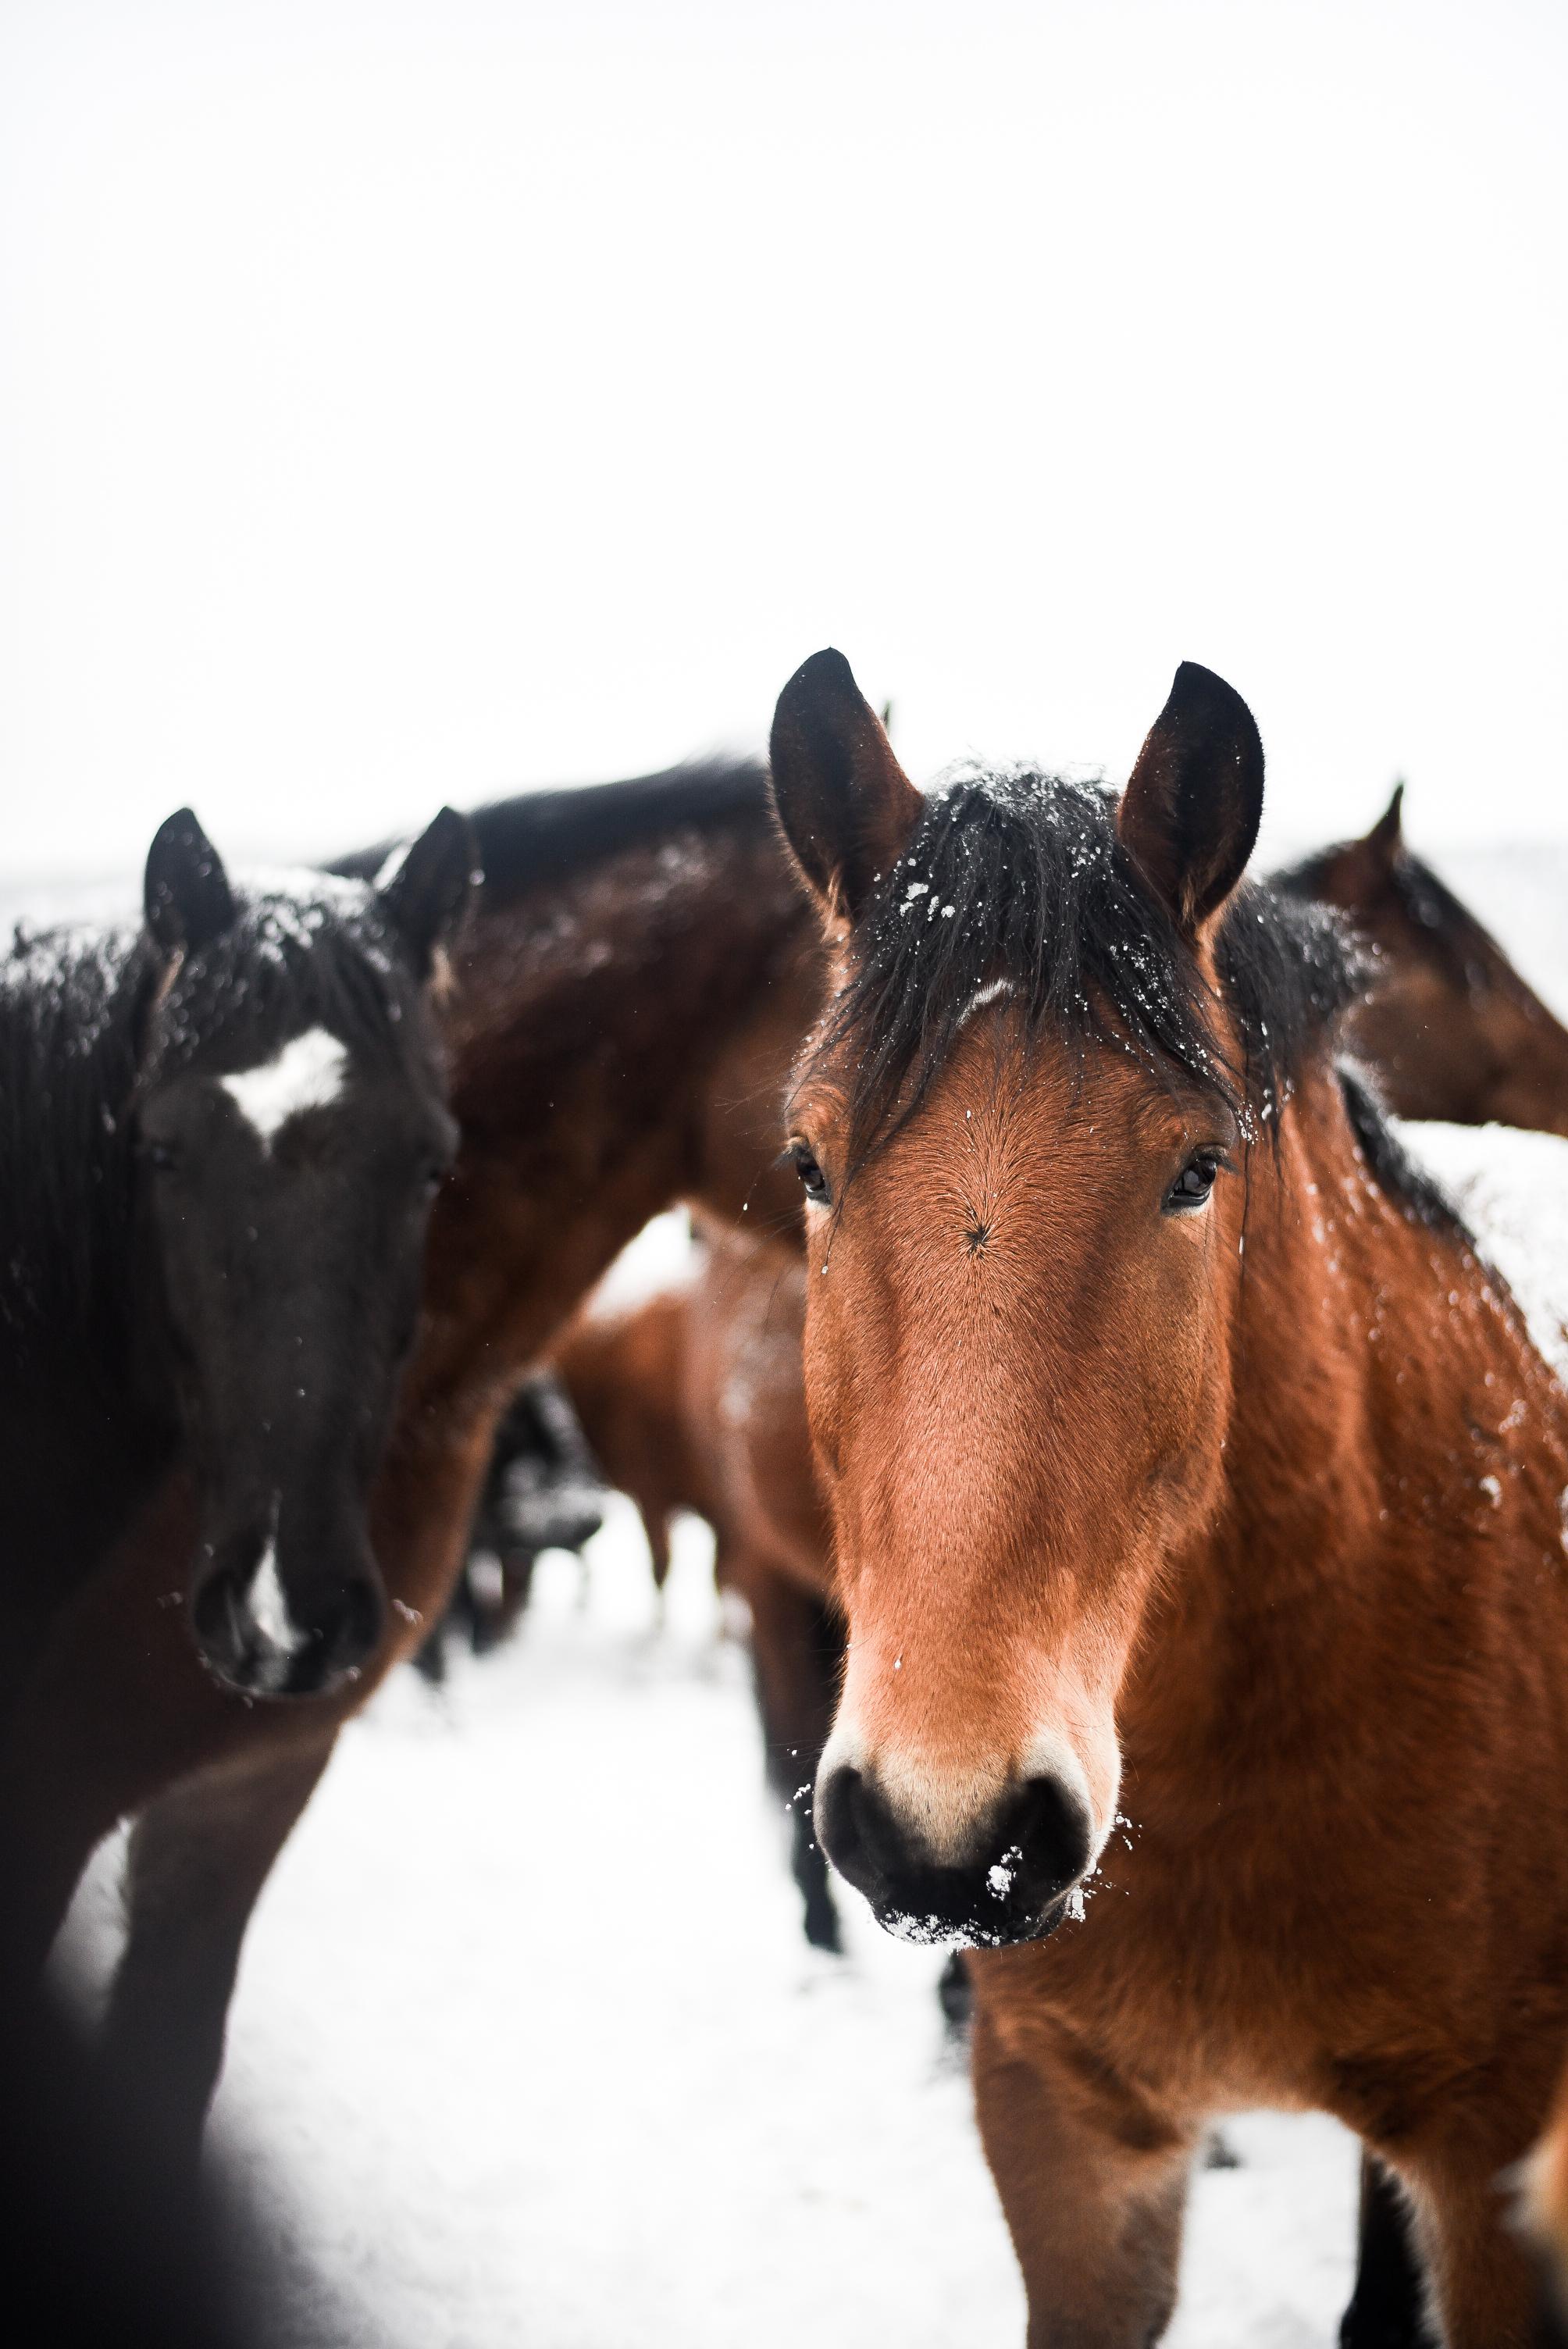 Snowy horses in Jess Valley, CA | boxwoodavenue.com